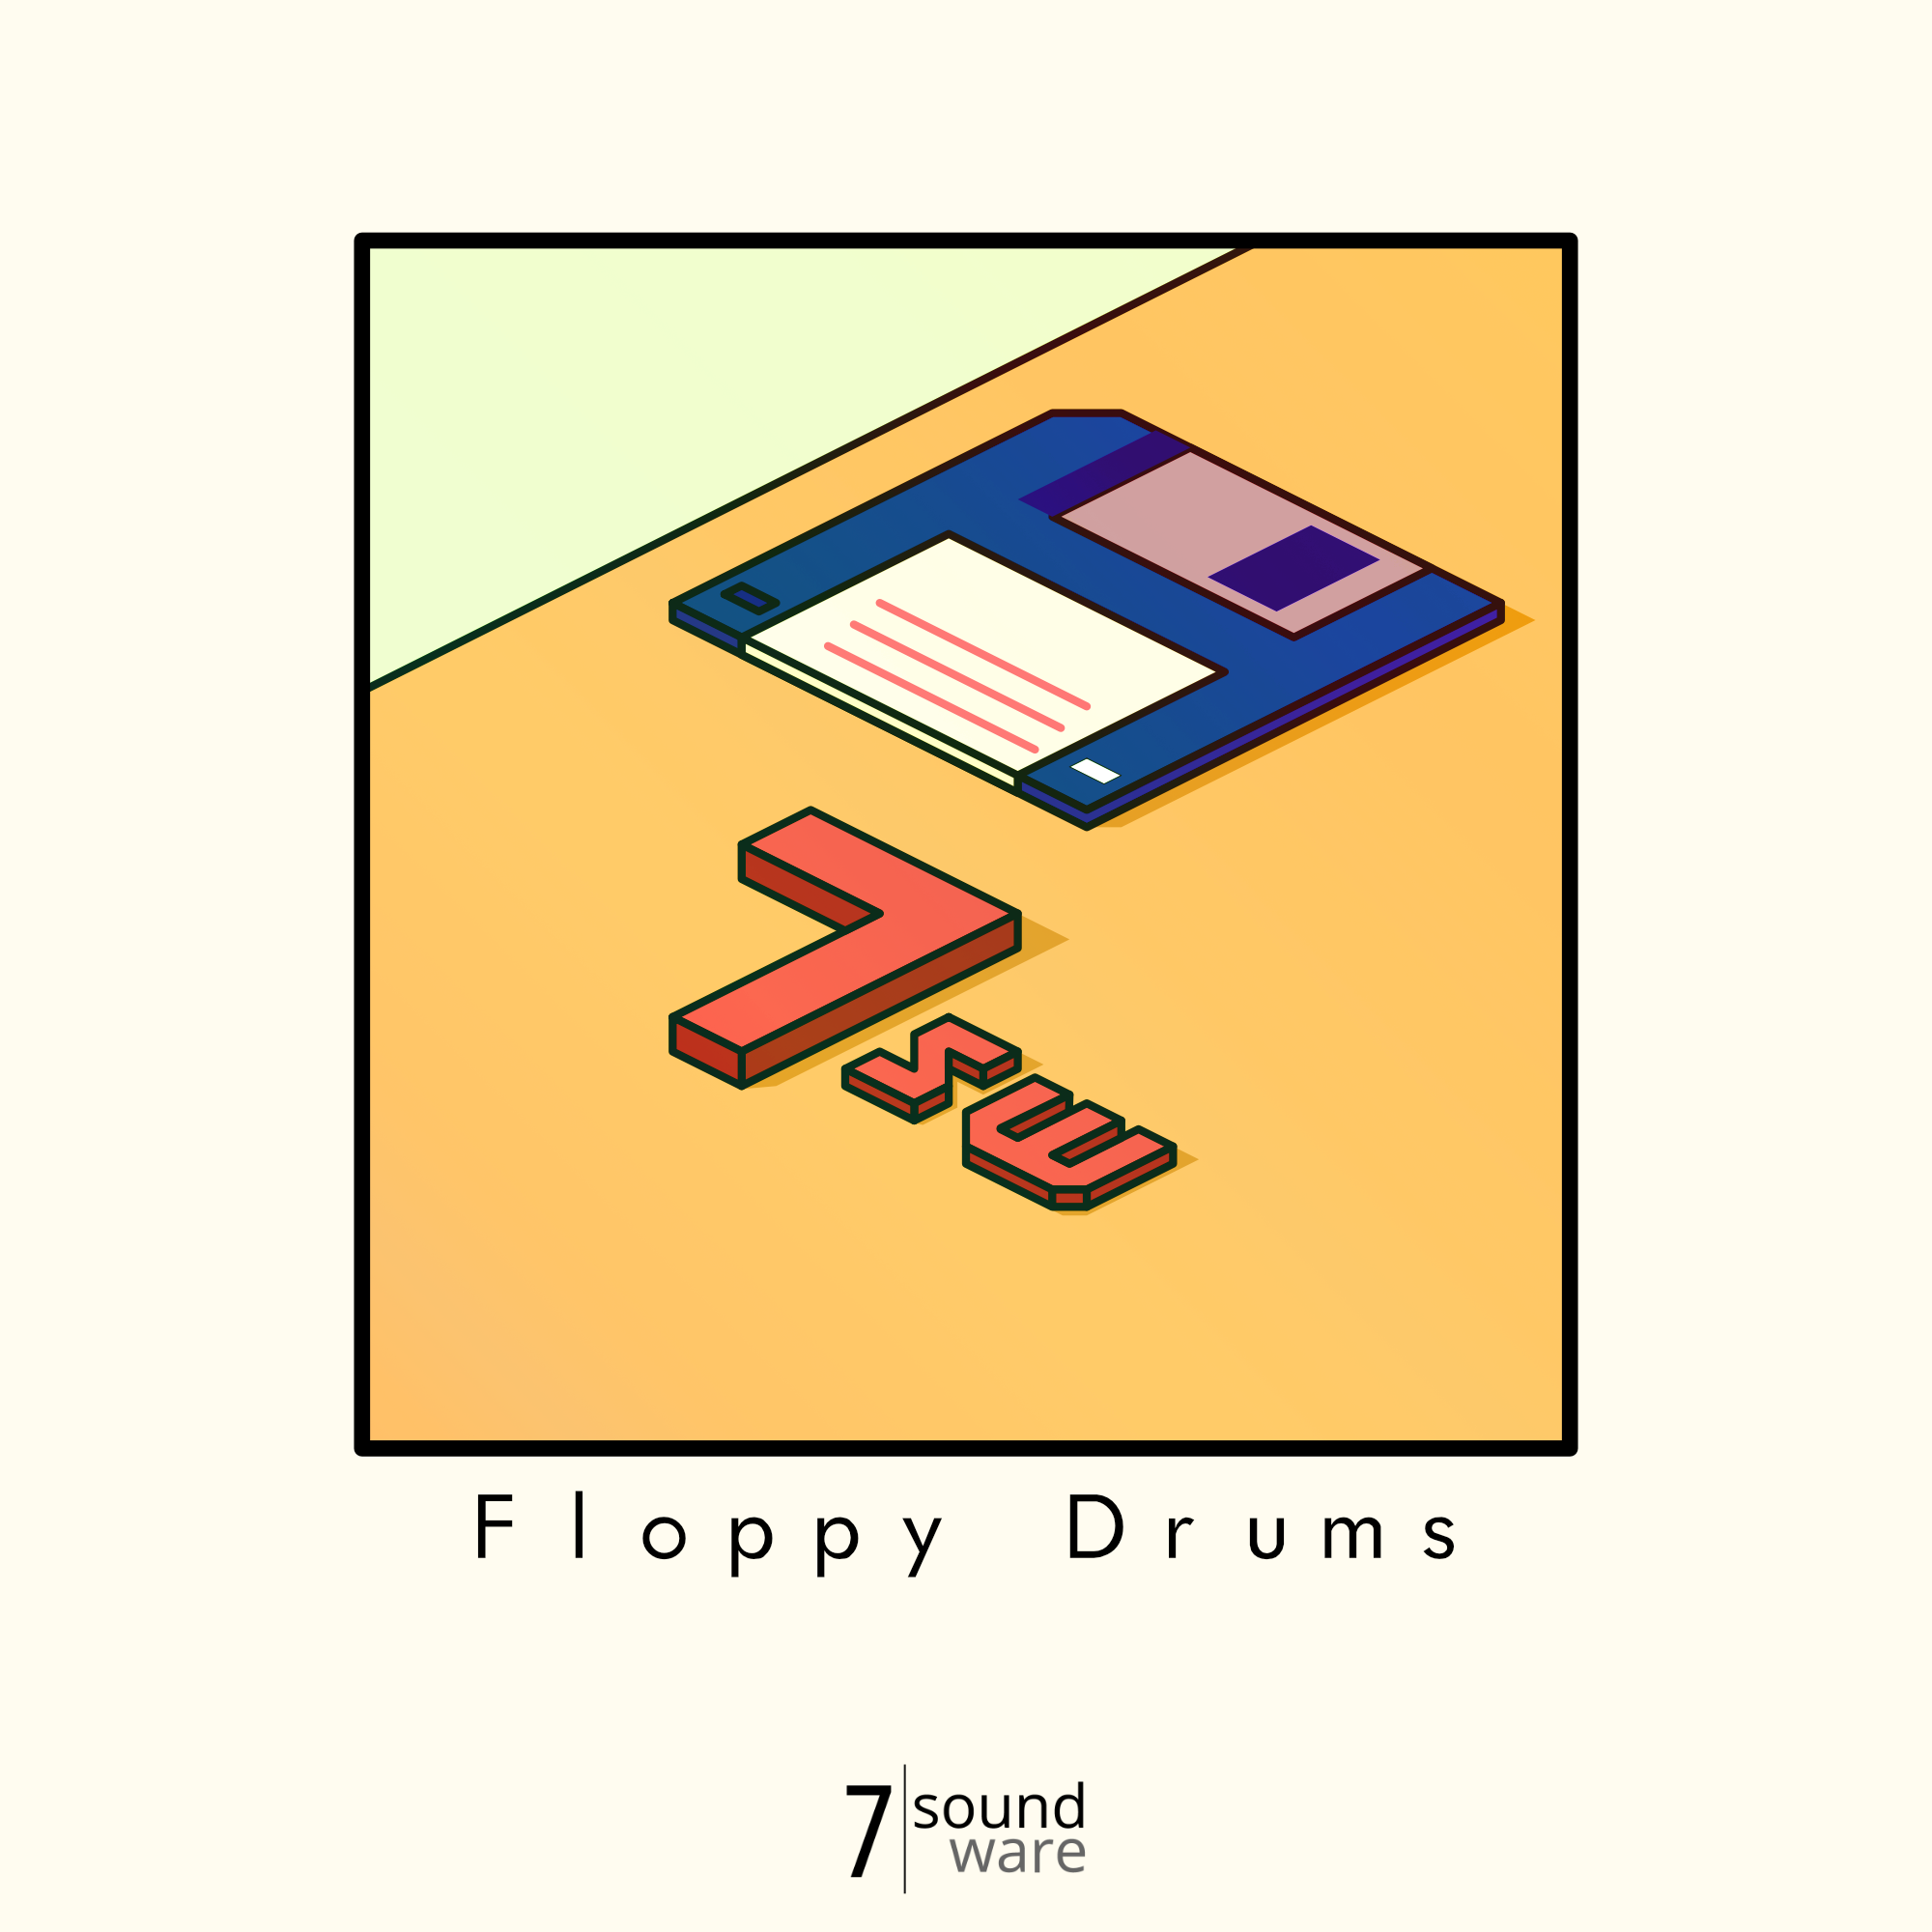 Floppy Drums